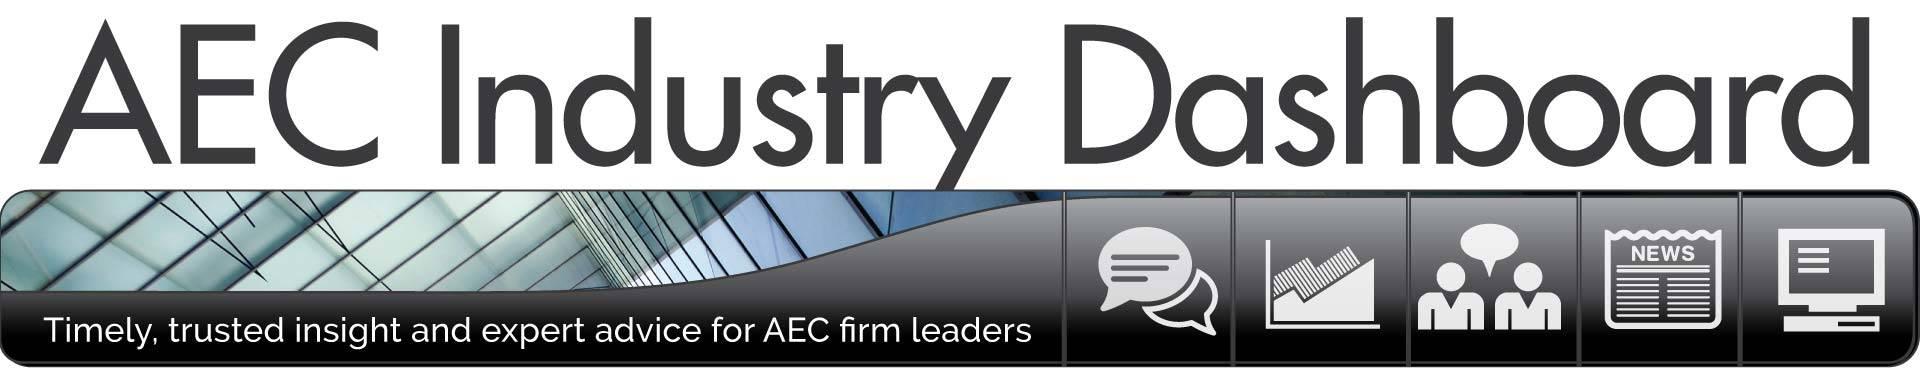 AEC Industry Dashboard